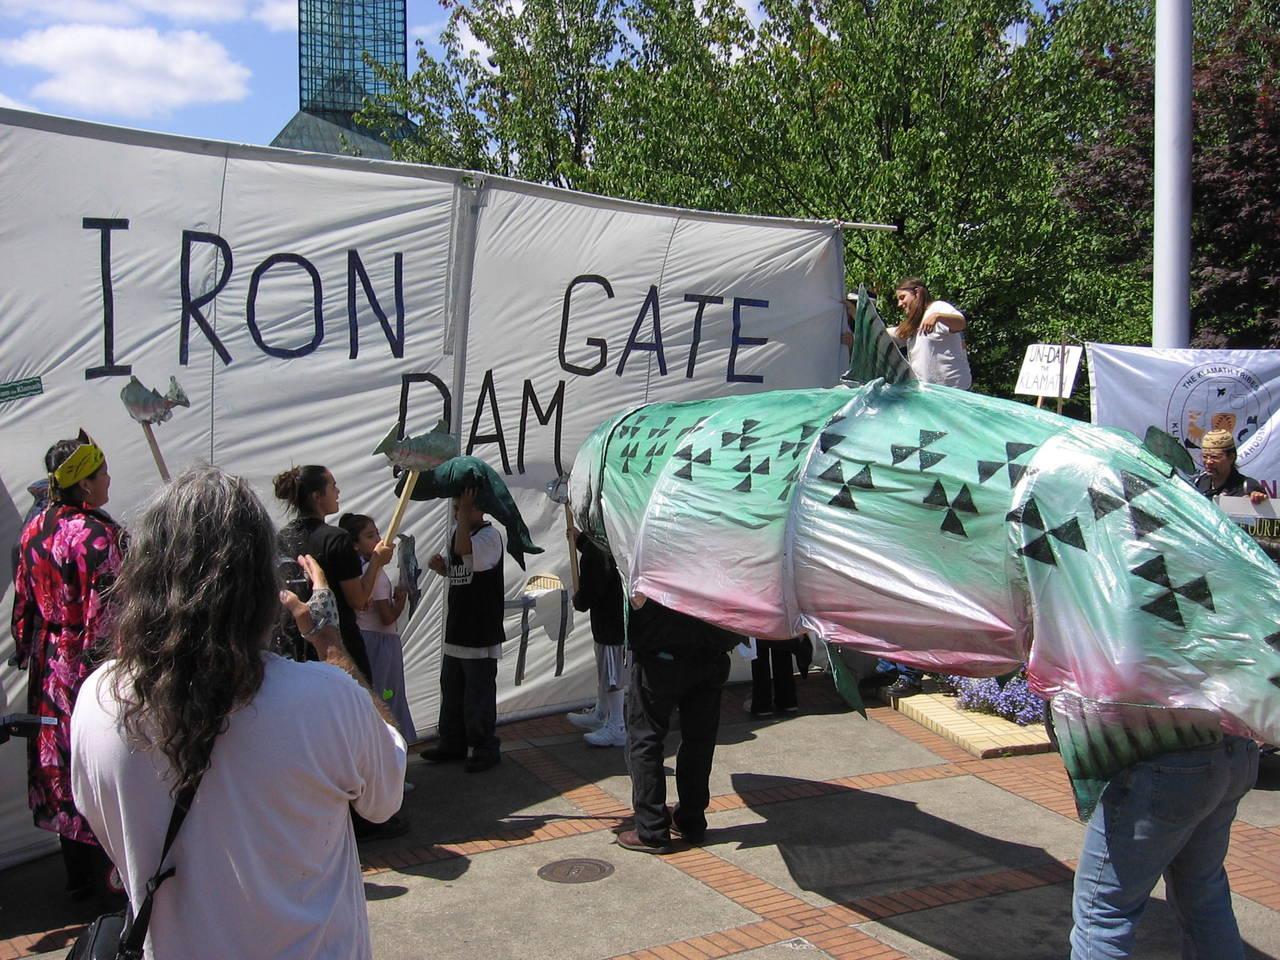 iron gate dam protest klamath river